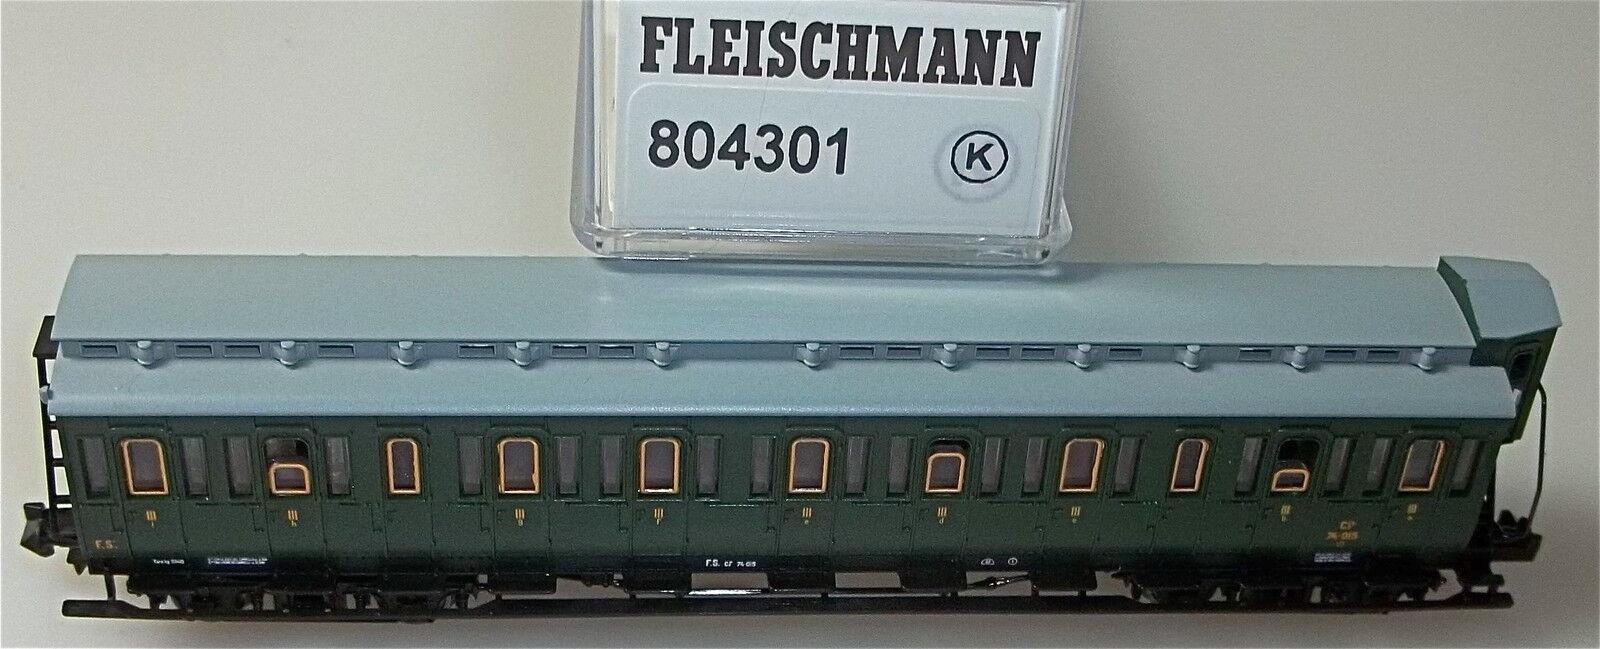 FS Carrozza con Scompartimenti 3  Cl. Fleischmann 804301 K 1/160 N